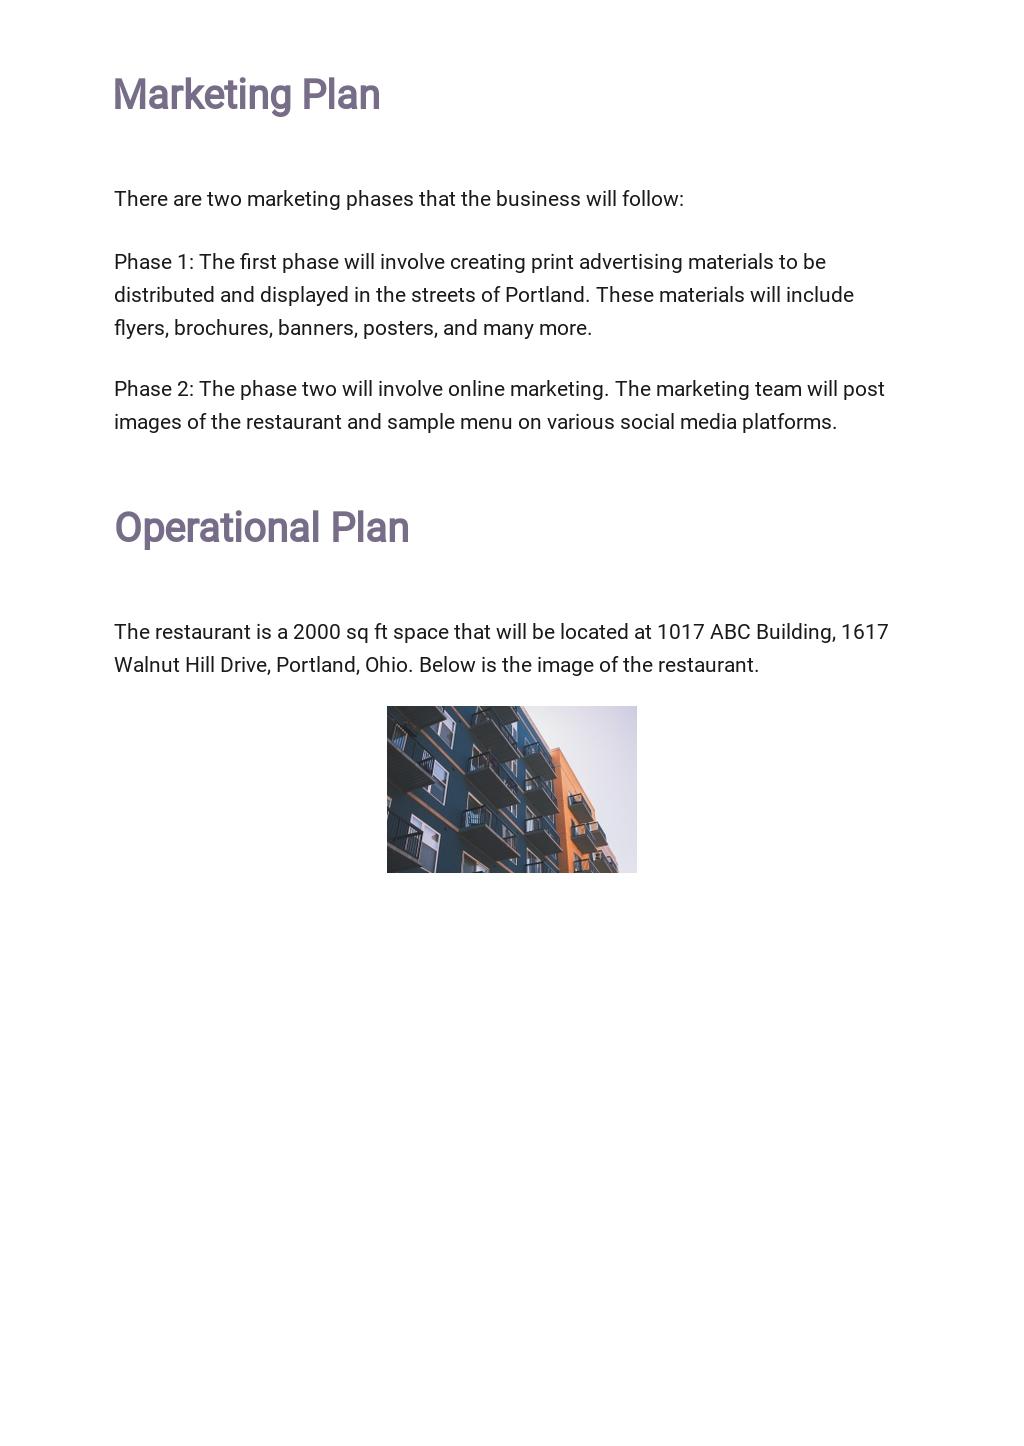 Restaurant Business Plan Outline Template 4.jpe